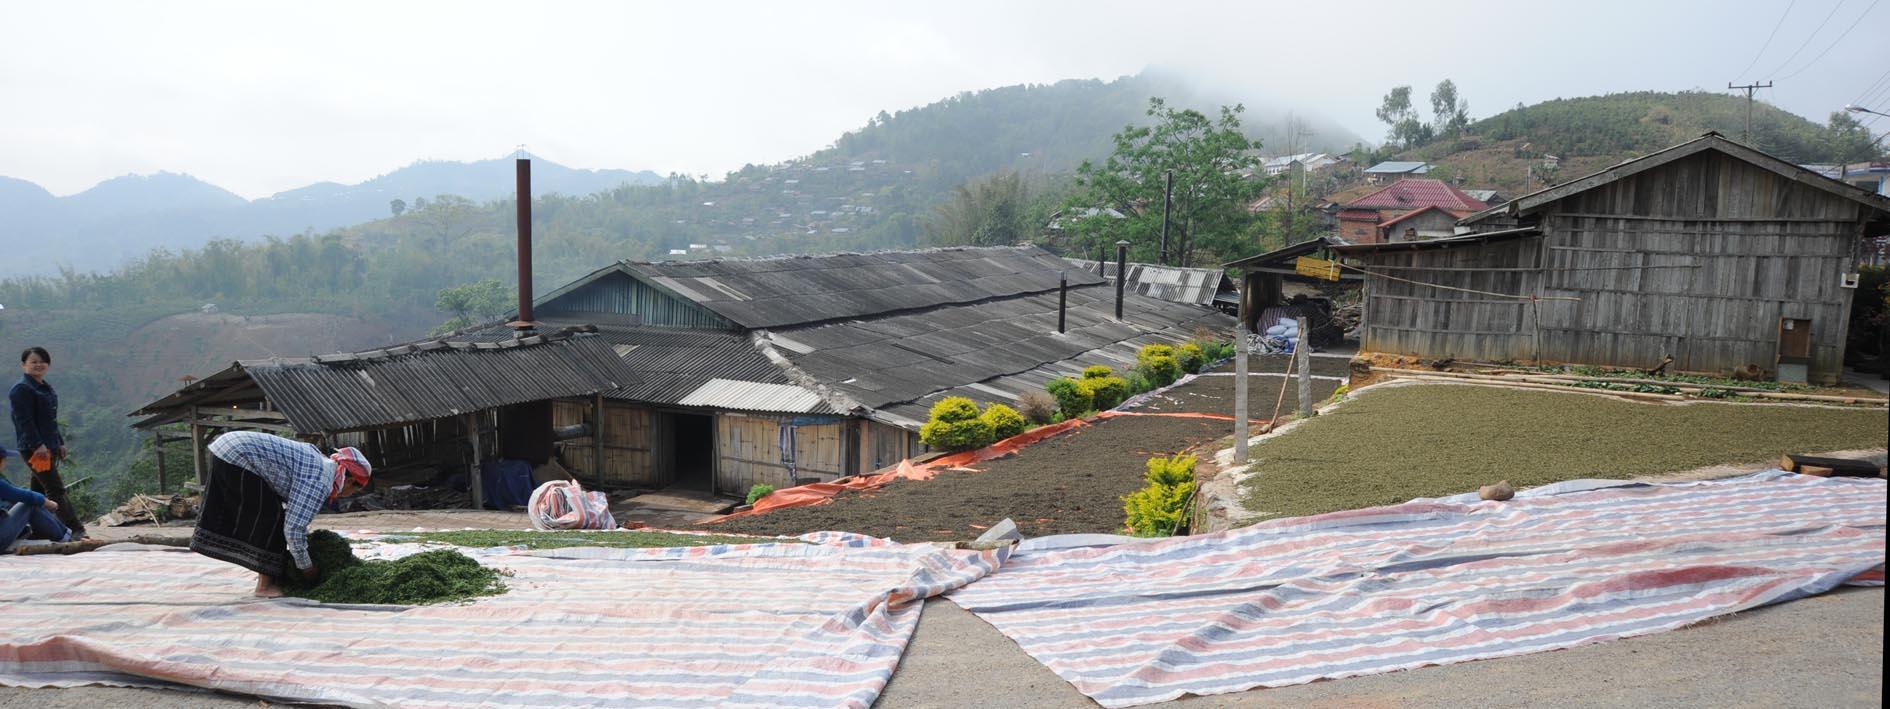 LaosP4